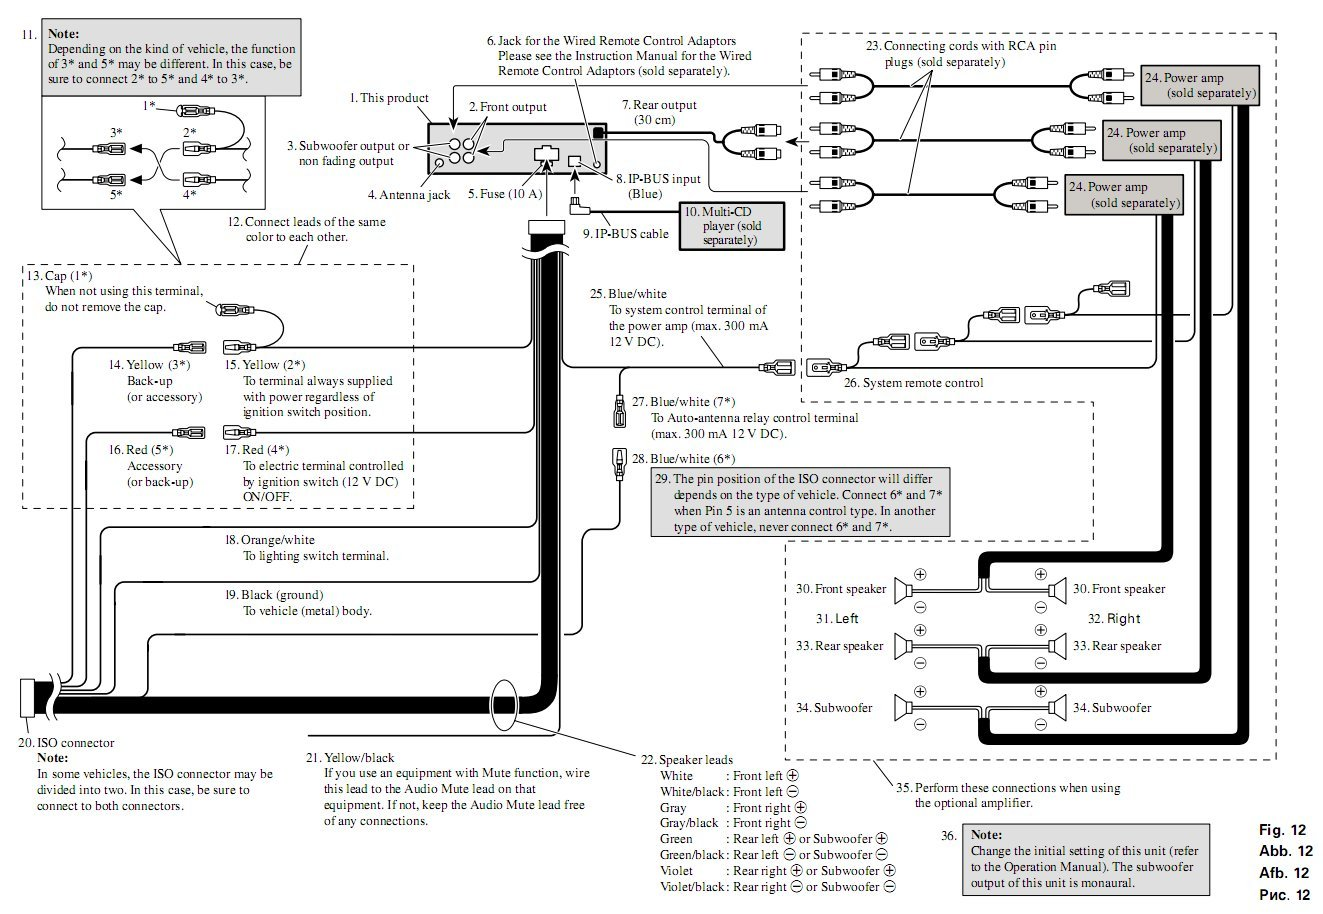 Pioneer Deh-x8600bh Wiring Diagram